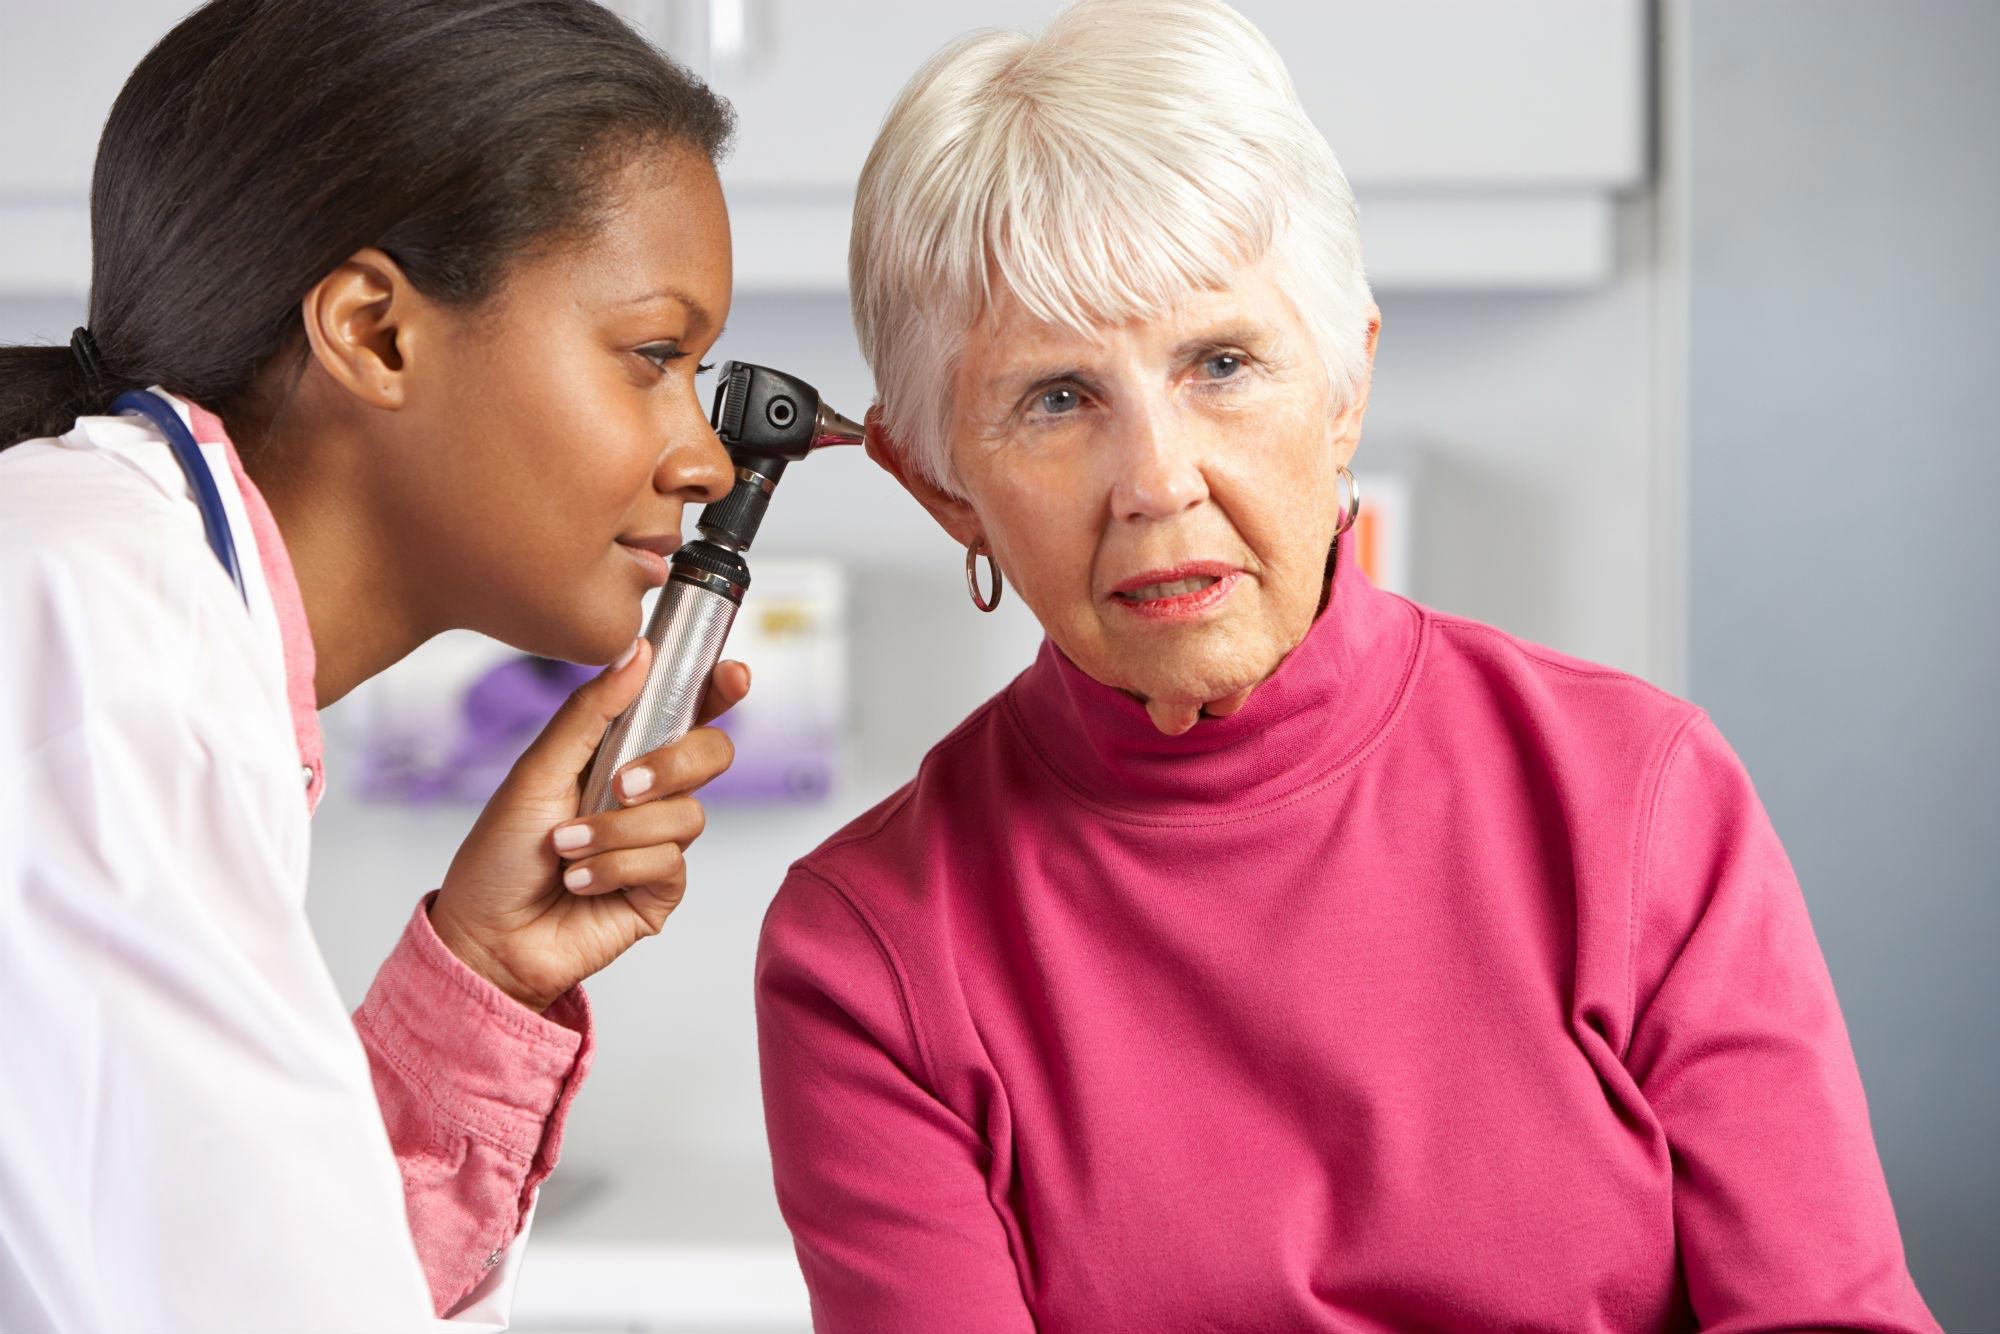 presbiacusia-perda-auditiva-terceira-idade